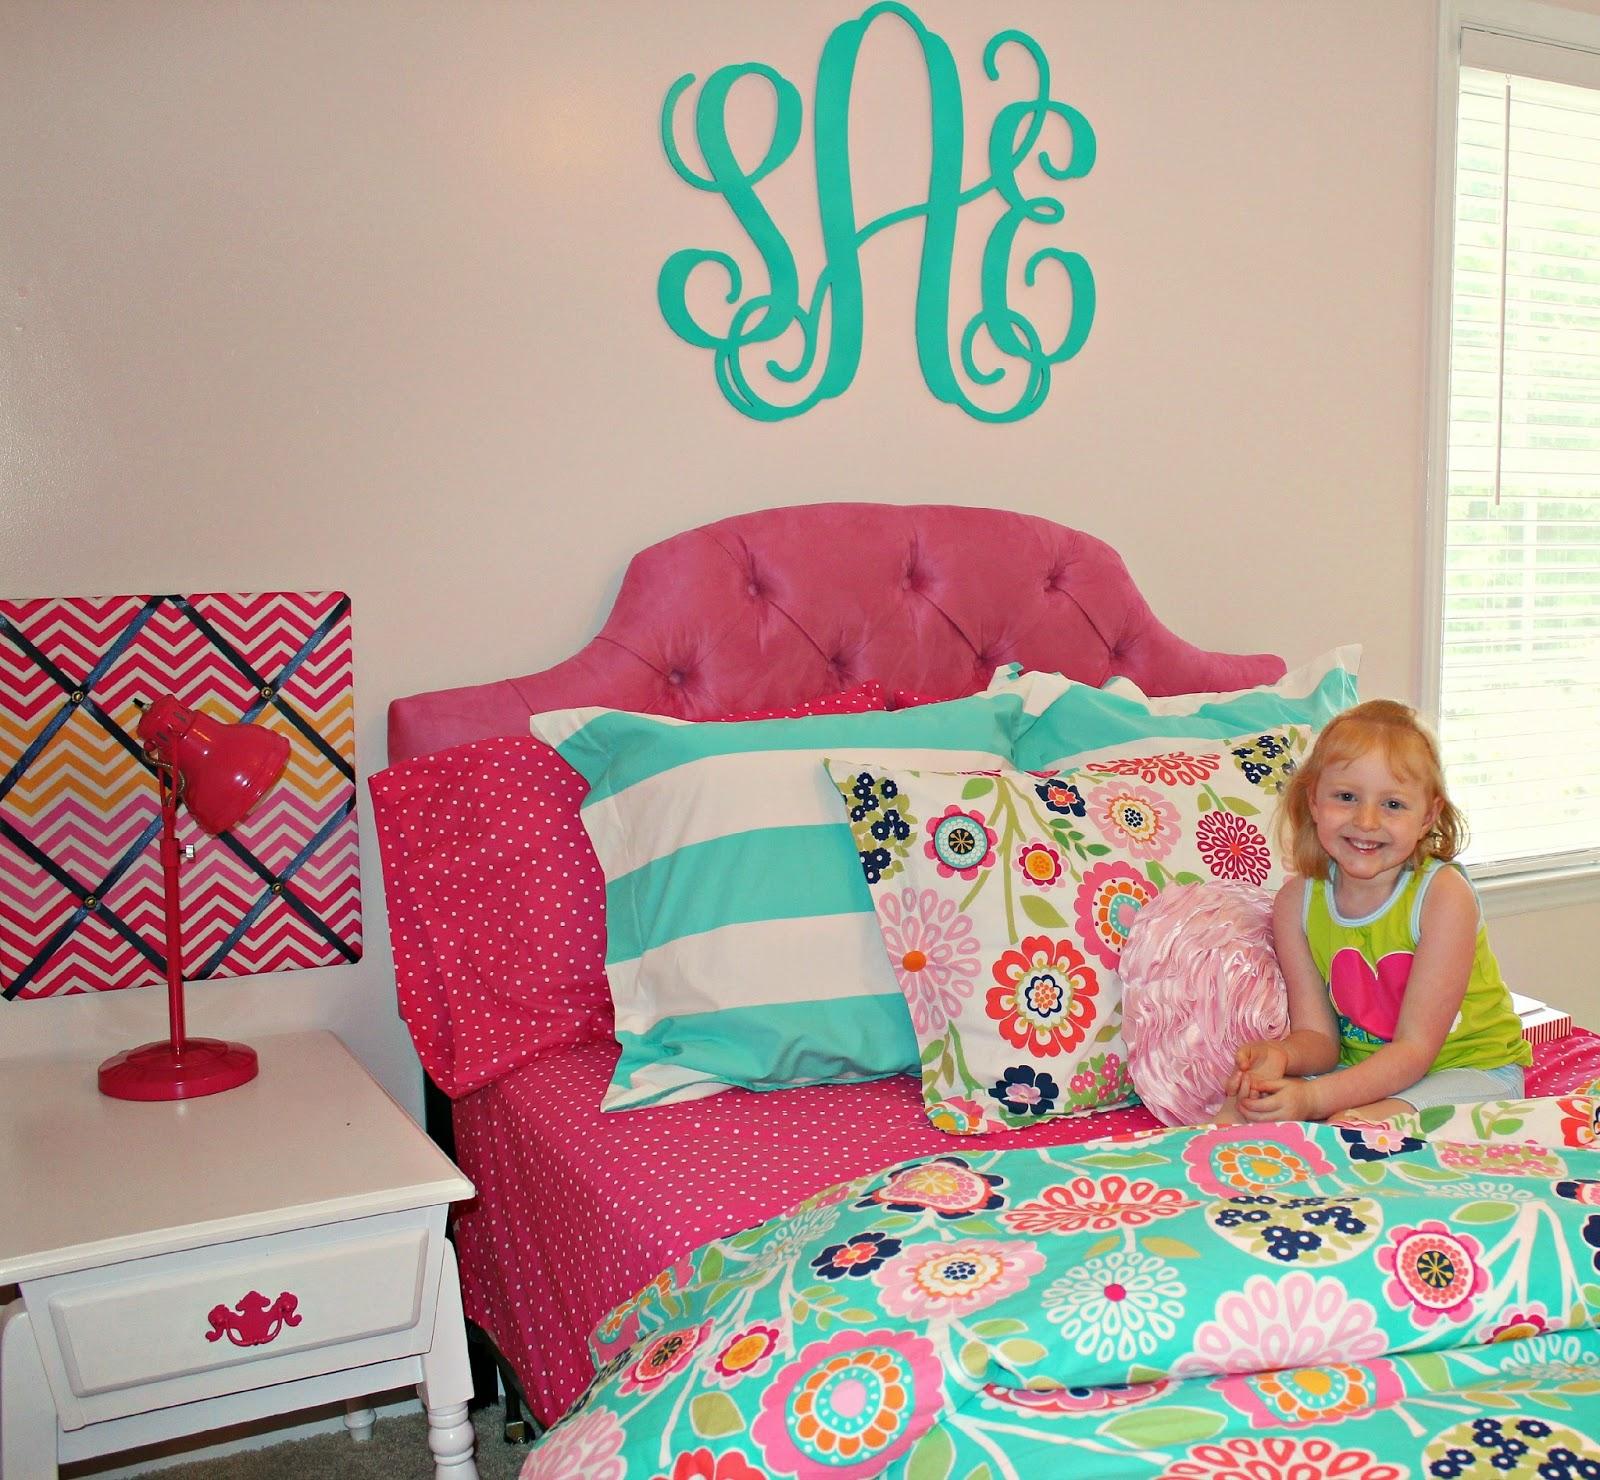 Hot Pink And Turquoise Girls Bedroom Makeover: Carolina On My Mind: Big Girl Bedroom: Monogram Over Bed